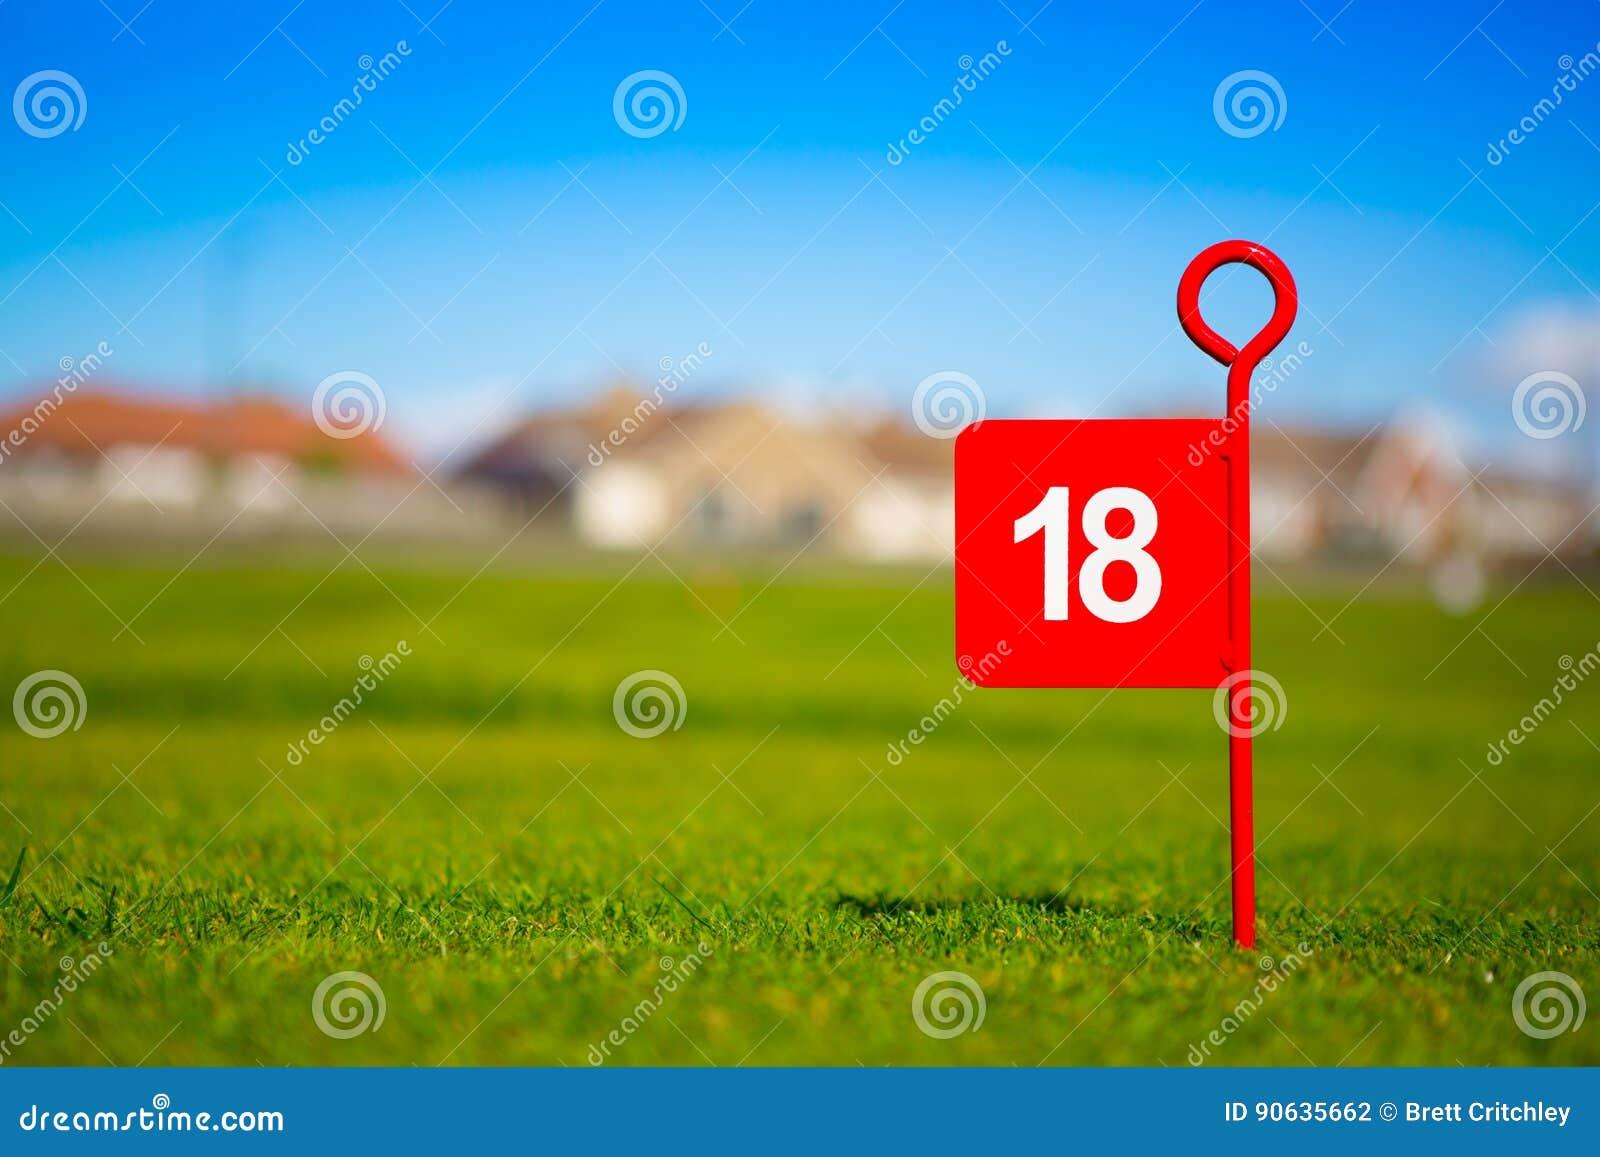 Red 18 hole golf flag